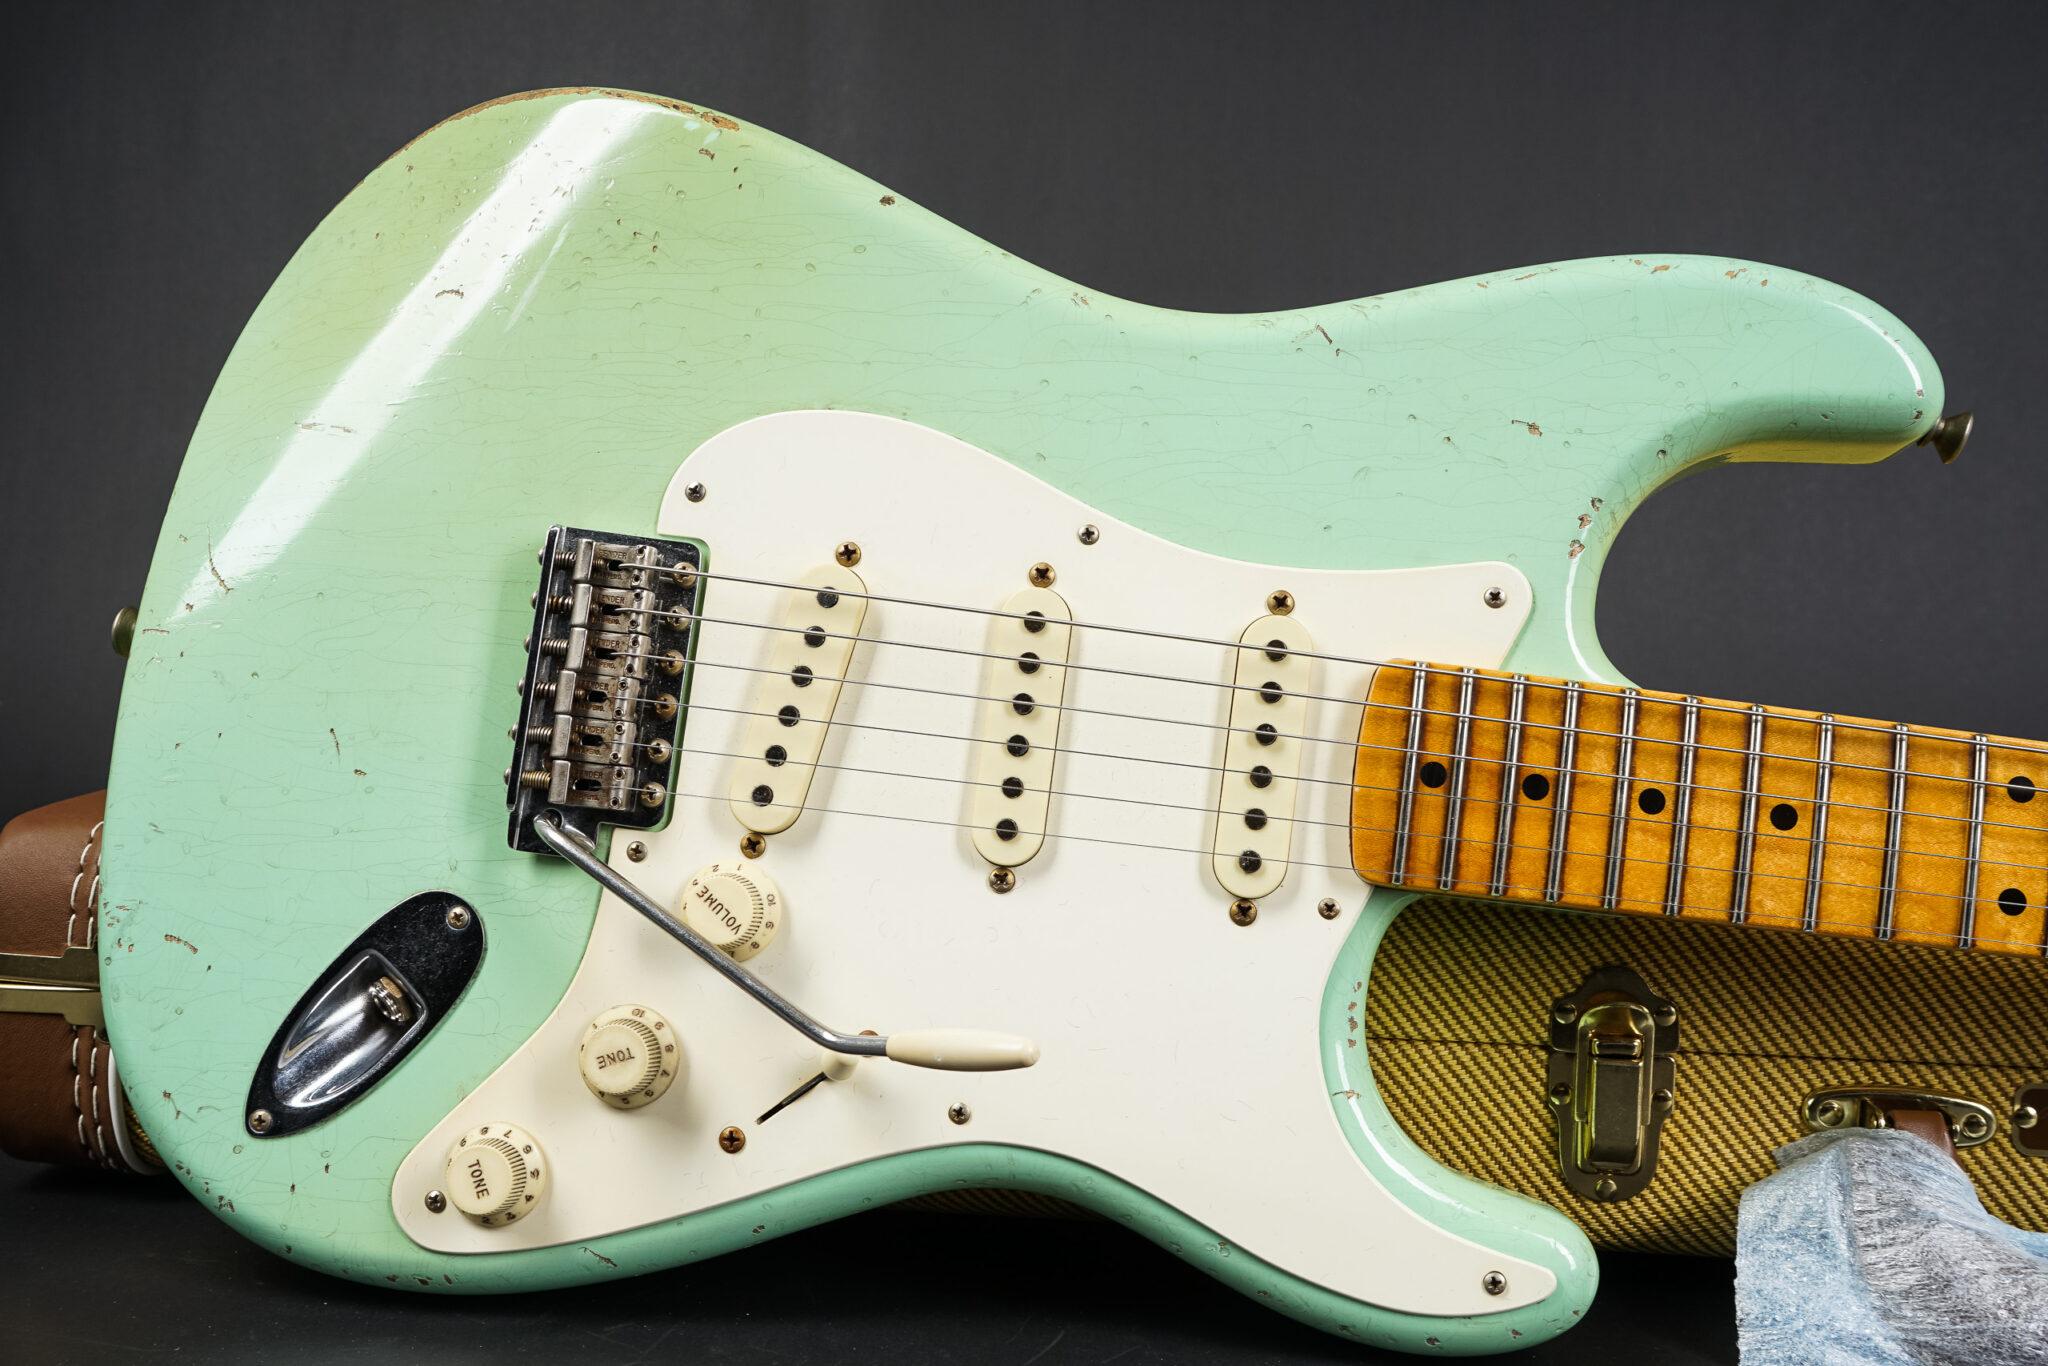 https://guitarpoint.de/app/uploads/products/2017-fender-john-cruz-masterbuilt-1957-stratocaster-relic-surf-green/2017-Fender-John-Cruz-Masterbuilt-JC3120-1957-Stratocaster-Relic-Surf-Green-7-2048x1366.jpg